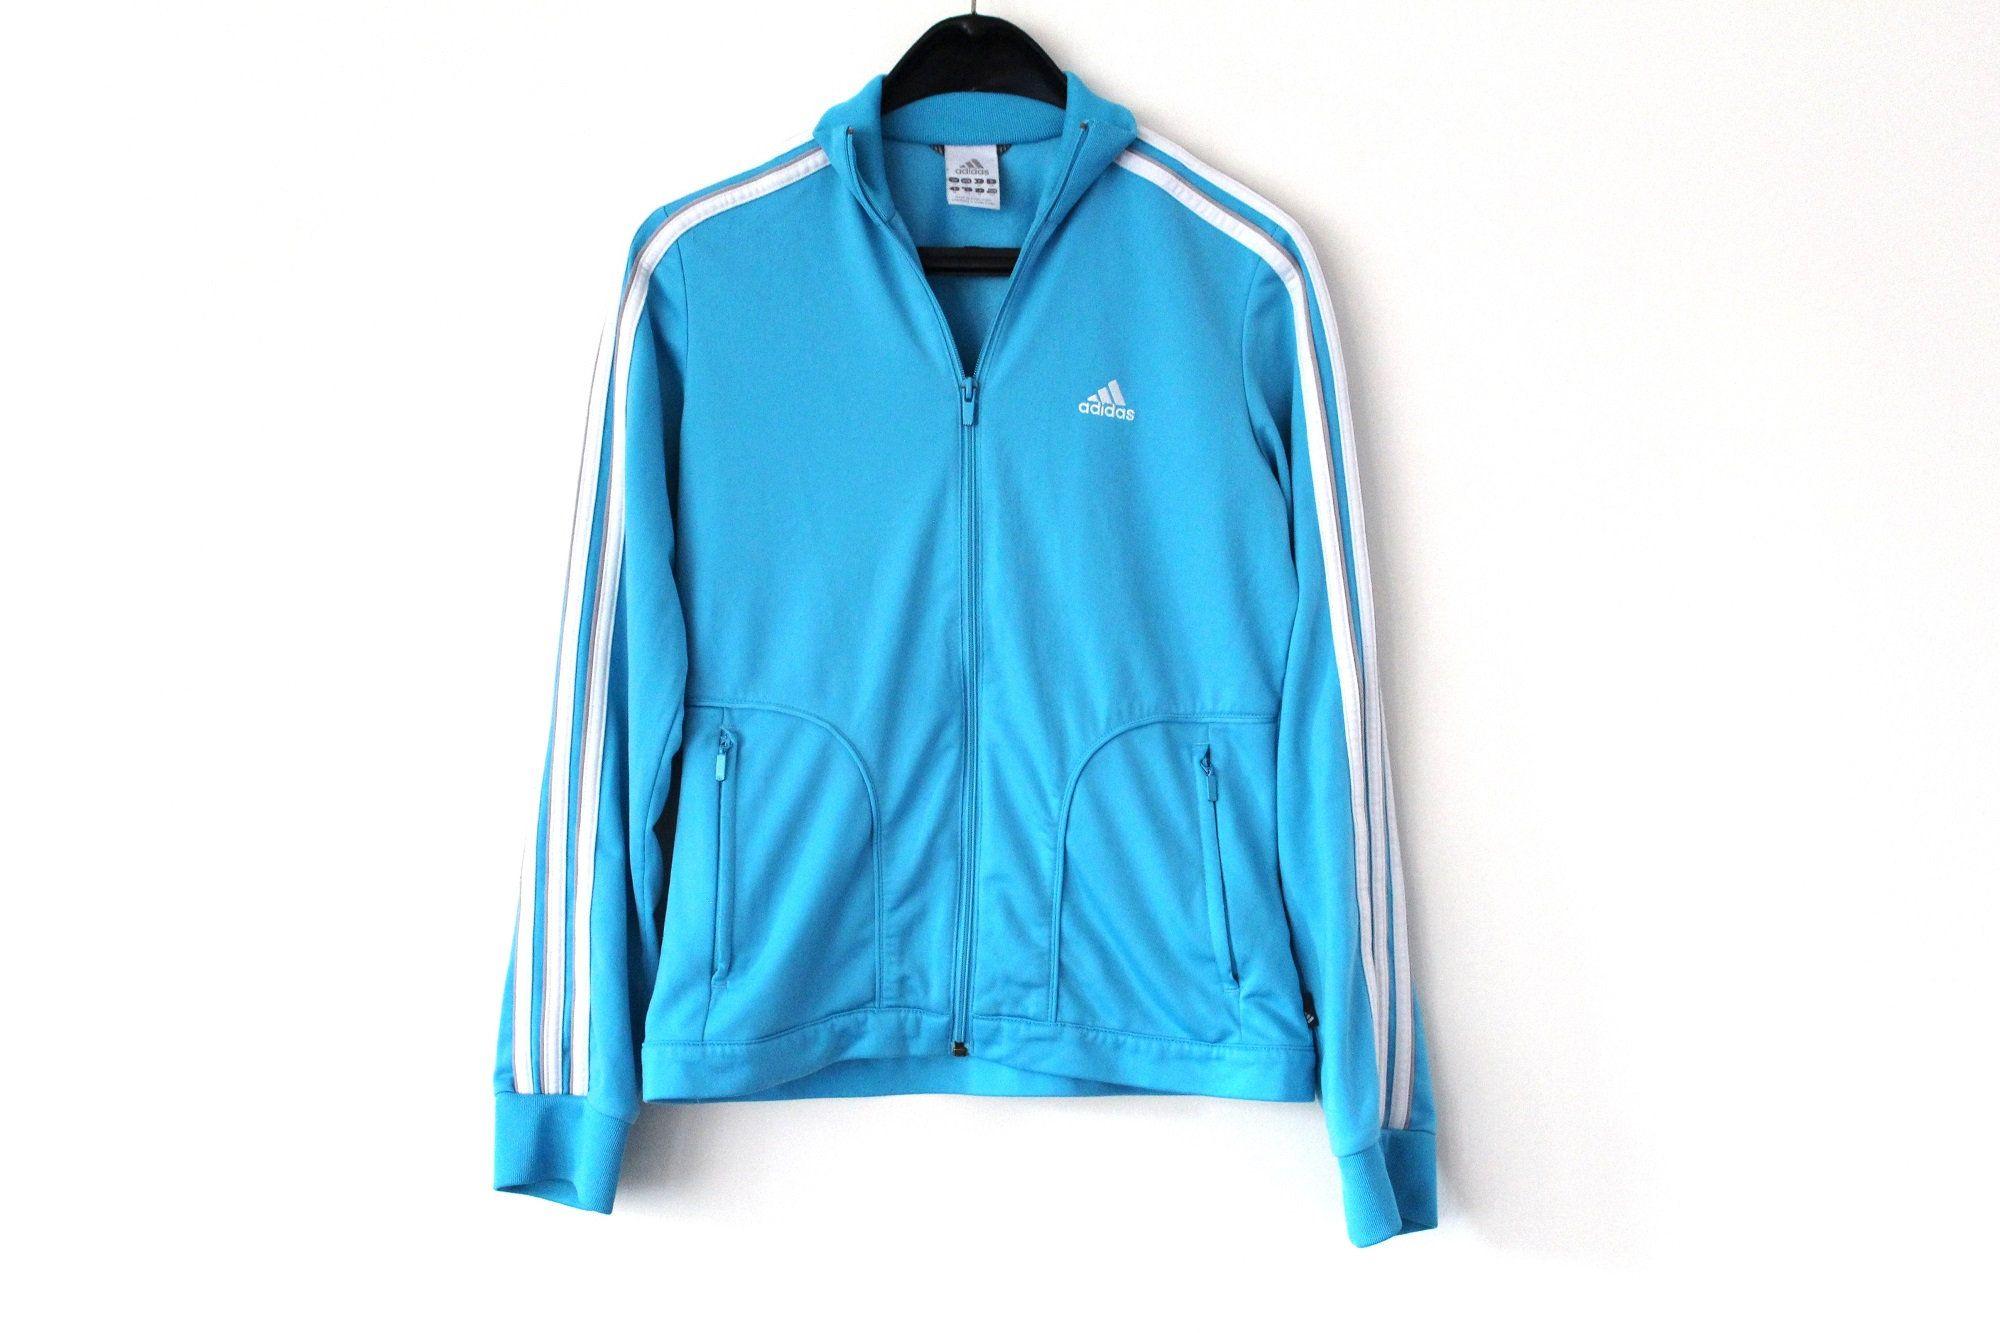 Blue White Adidas Track Jacket Vintage Sport Jacket Zipped Etsy Adidas Track Jacket White Adidas Pink Adidas Sweatshirt [ 1333 x 2000 Pixel ]